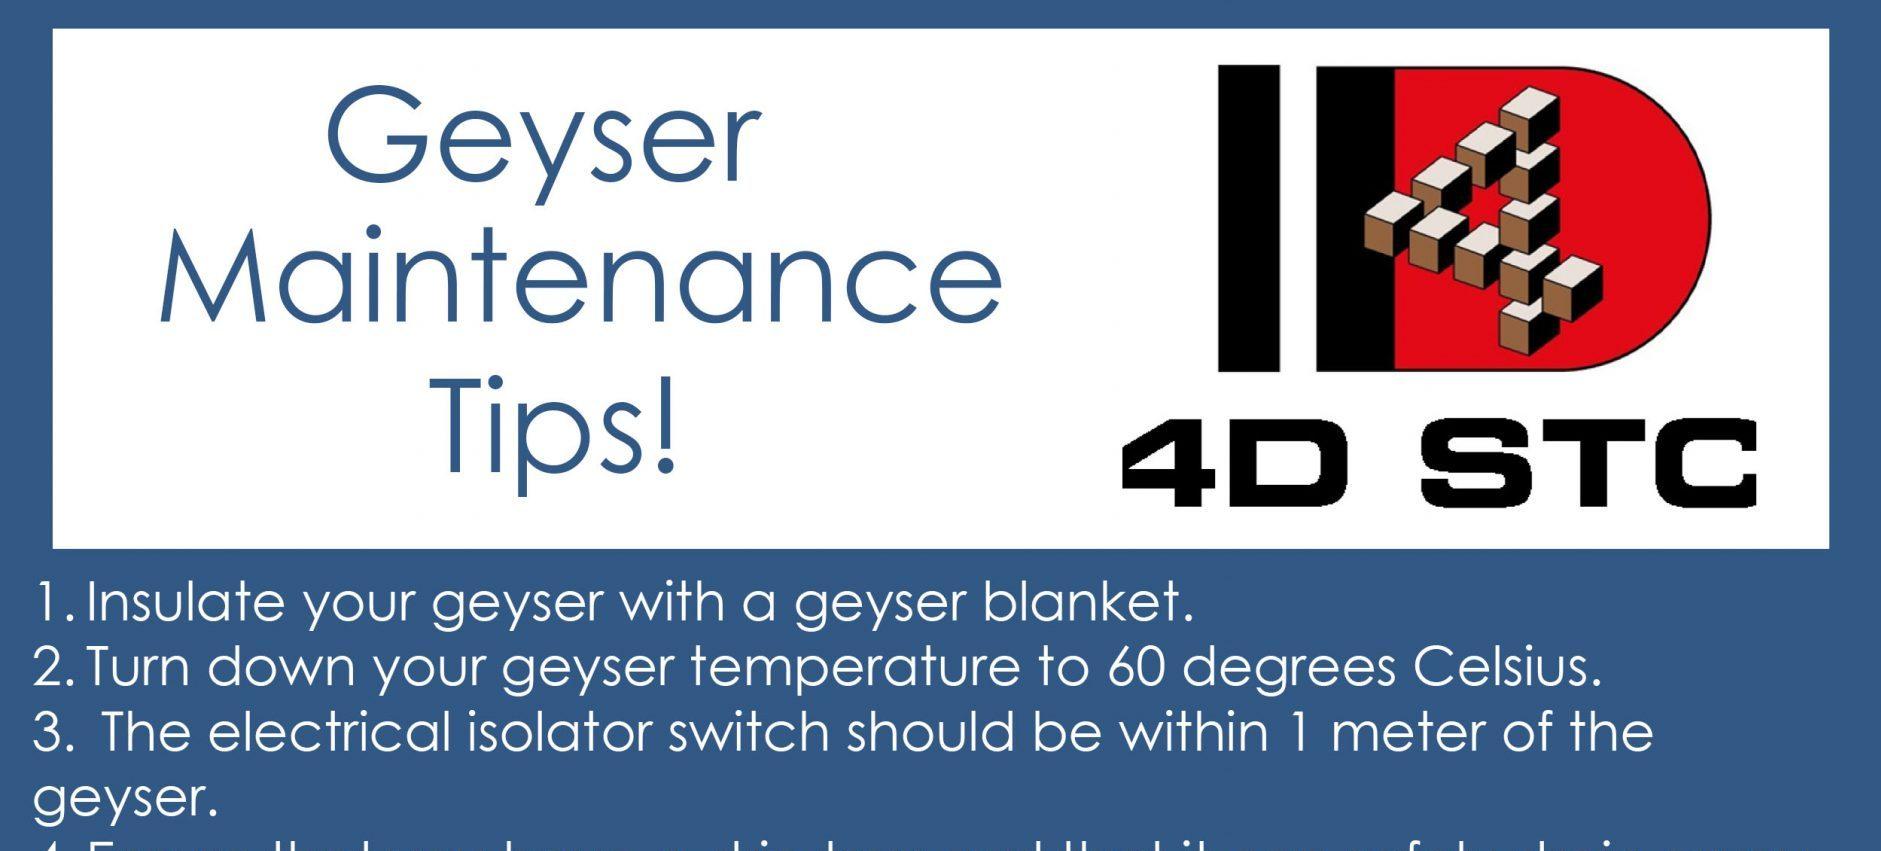 Geyser Maintenance Tips